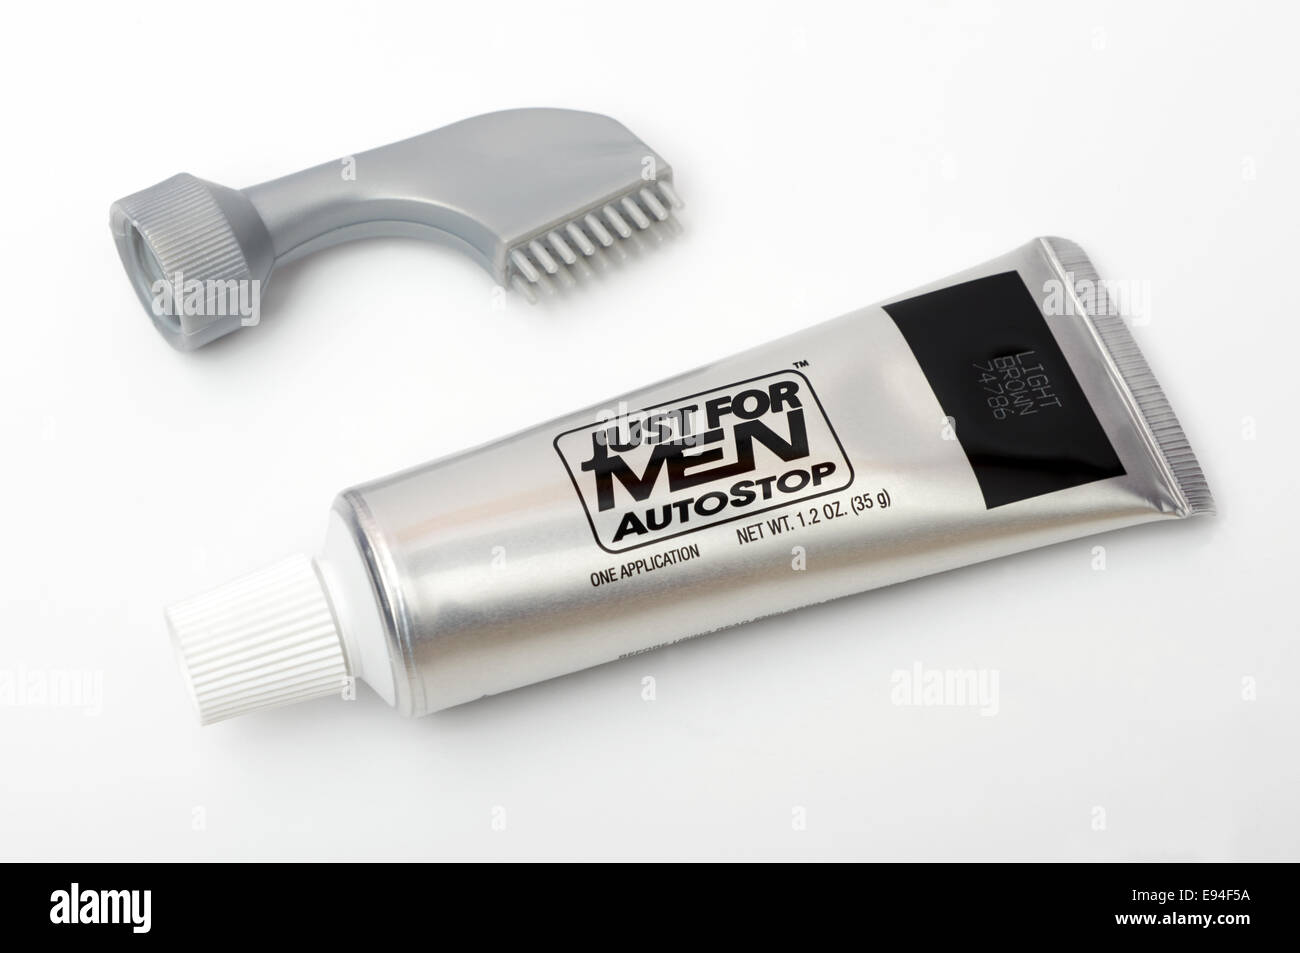 Just For Men AutoStop hair colour - Stock Image